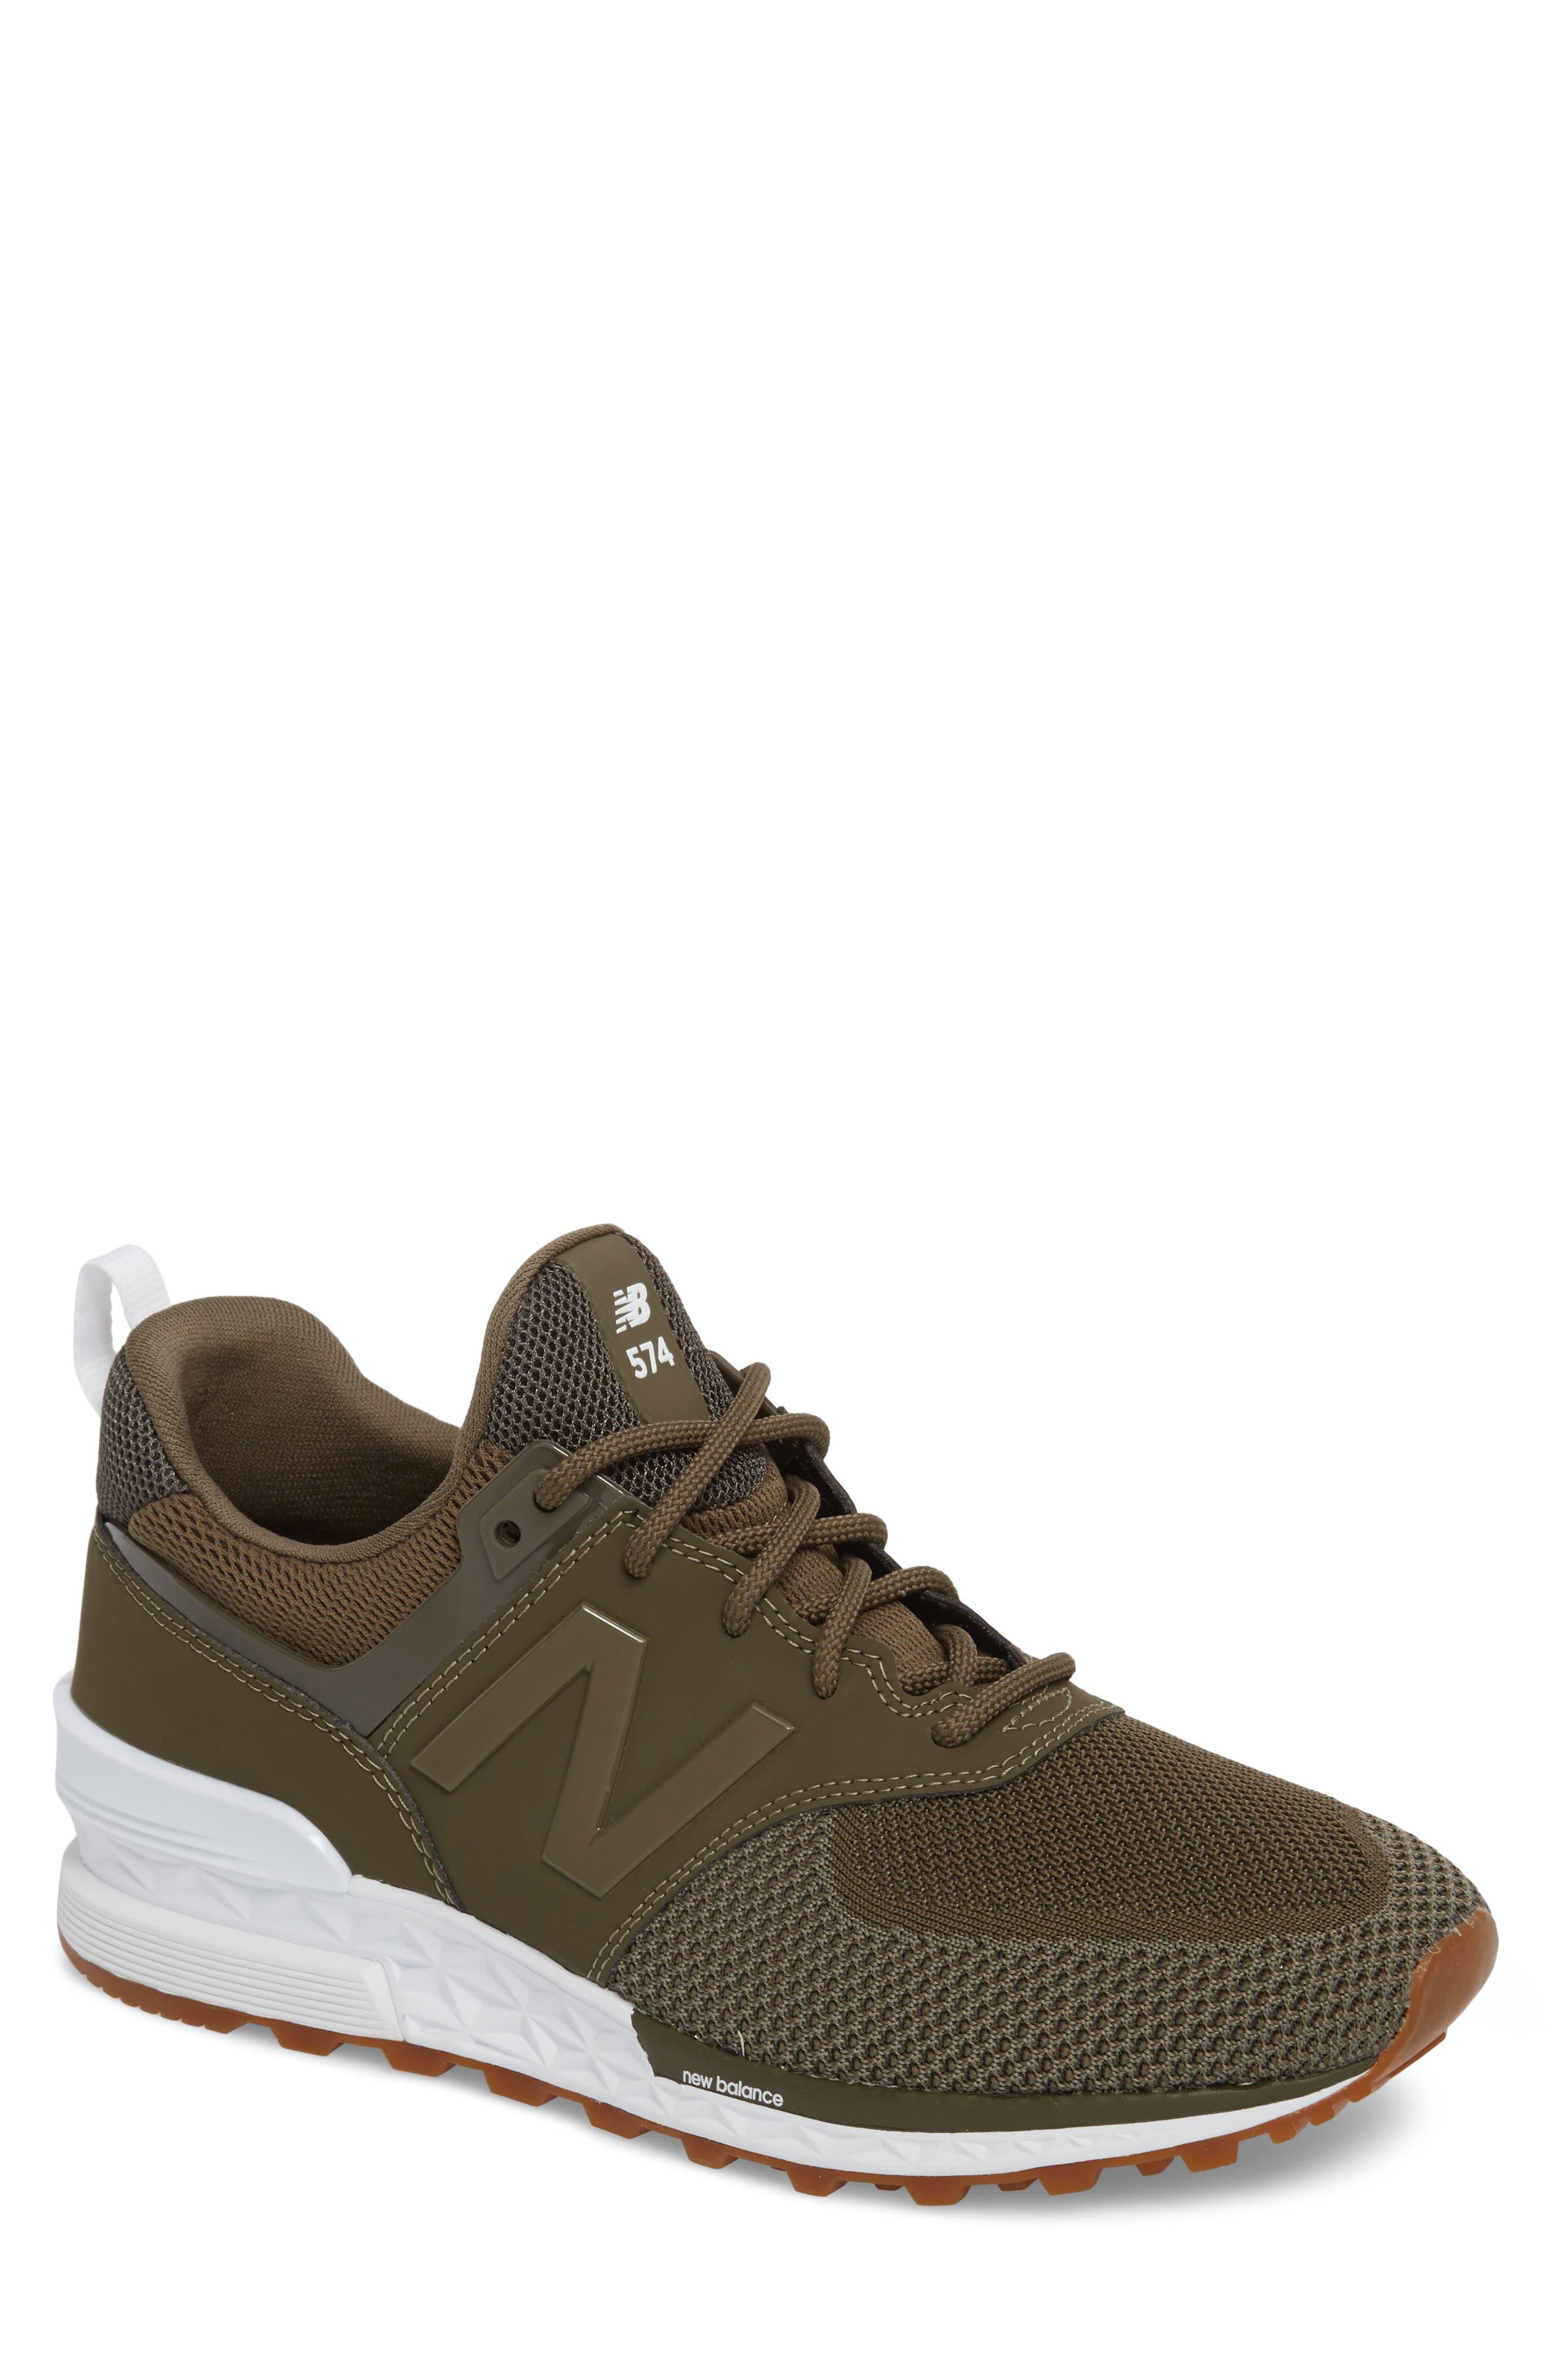 New Balance 574 Engineered Mesh Sneaker (Men)